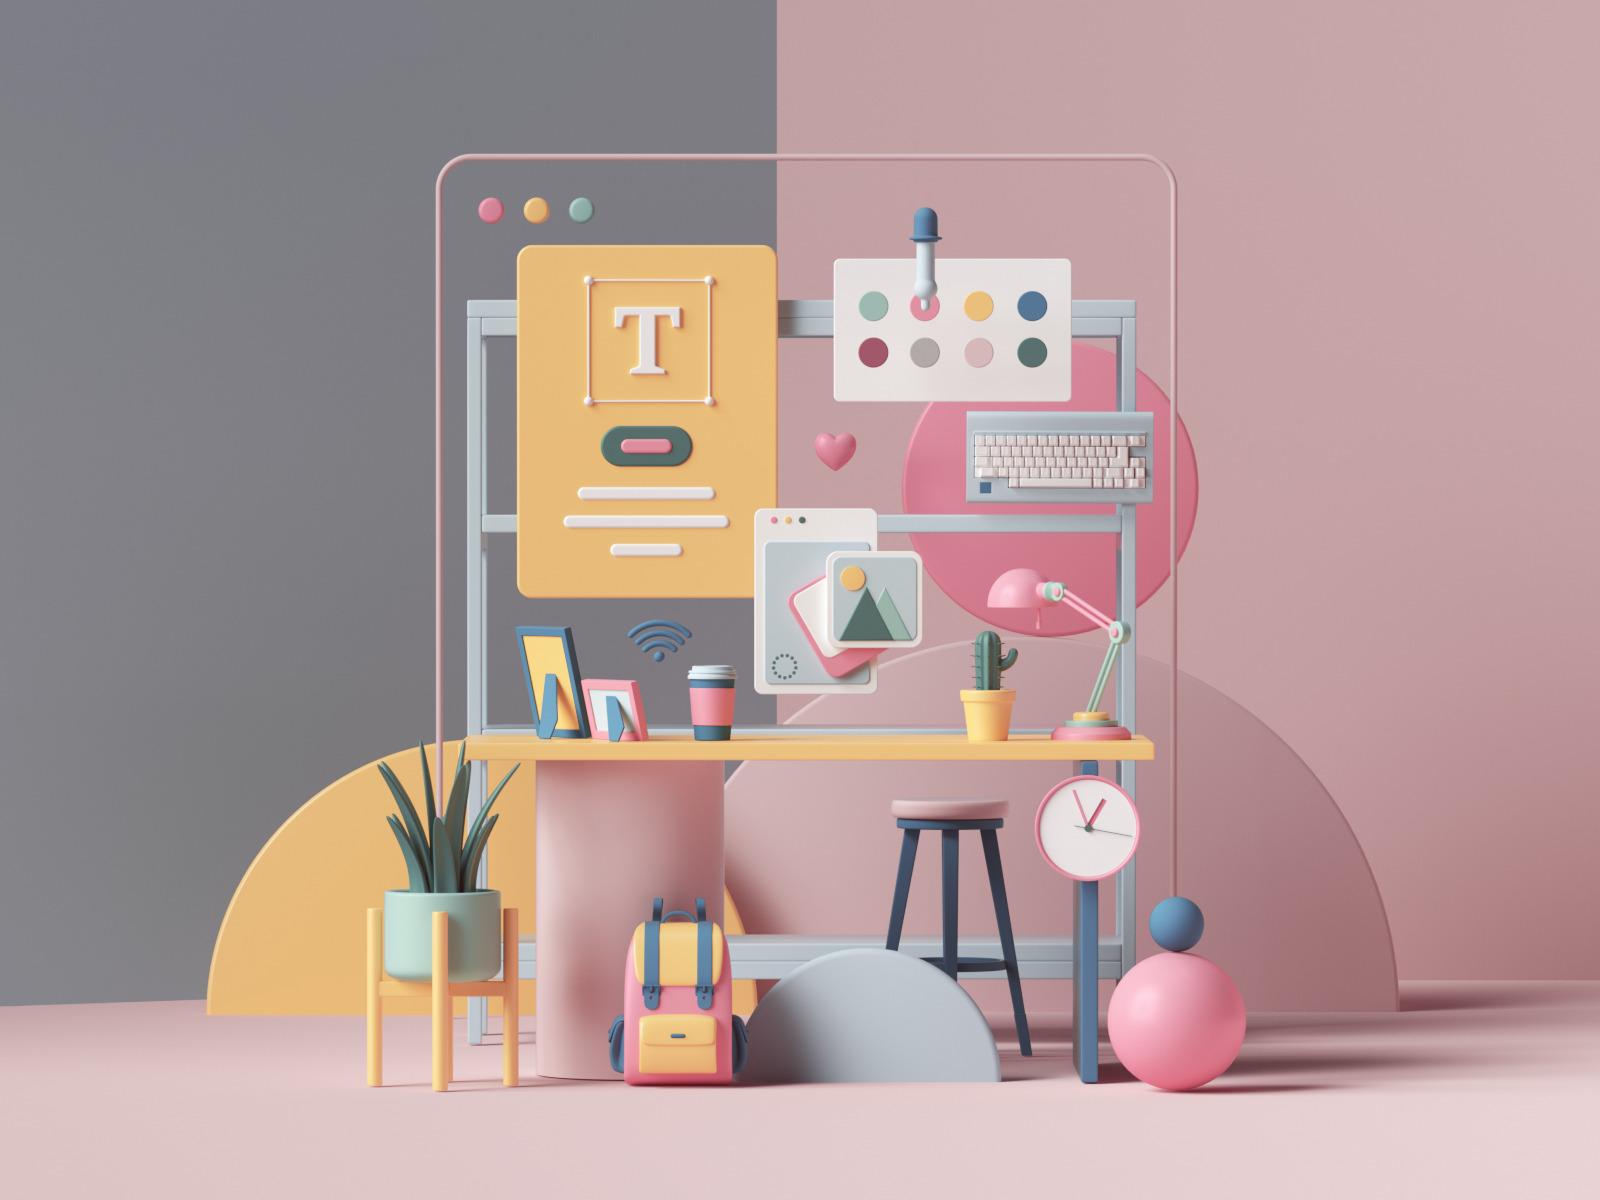 3d illustration workspace